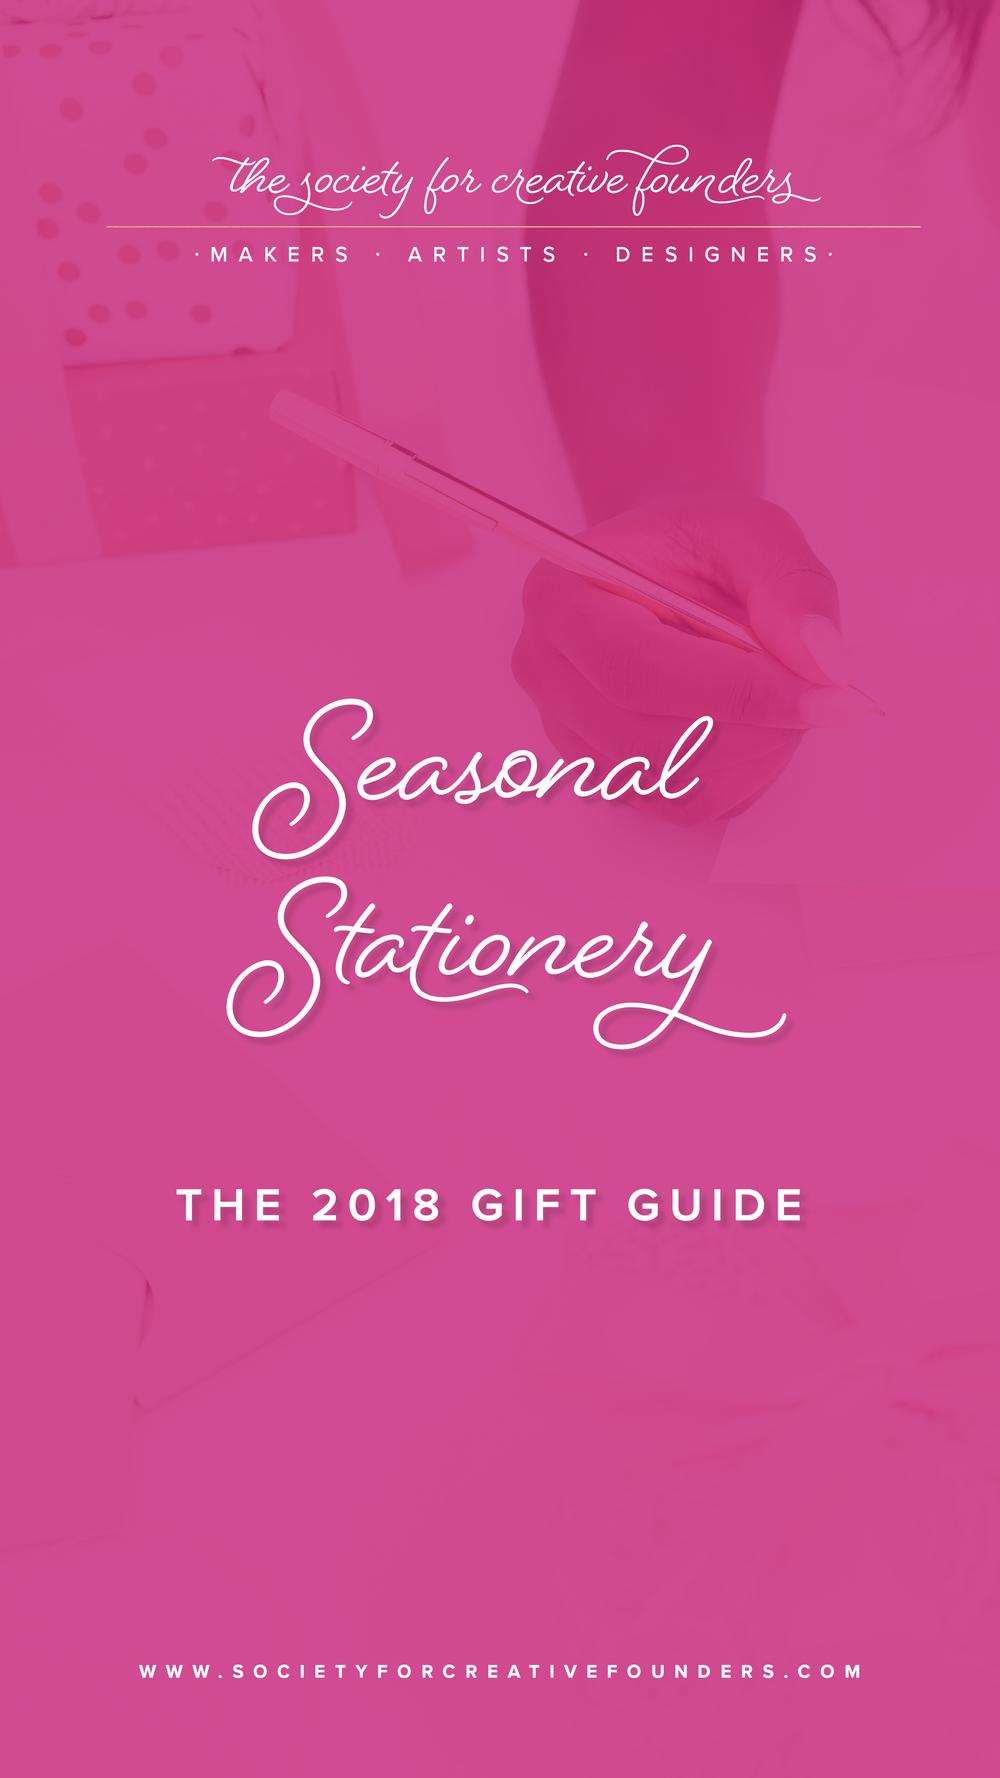 Seasonal Stationery - Creative Founders 2018 Gift Guide